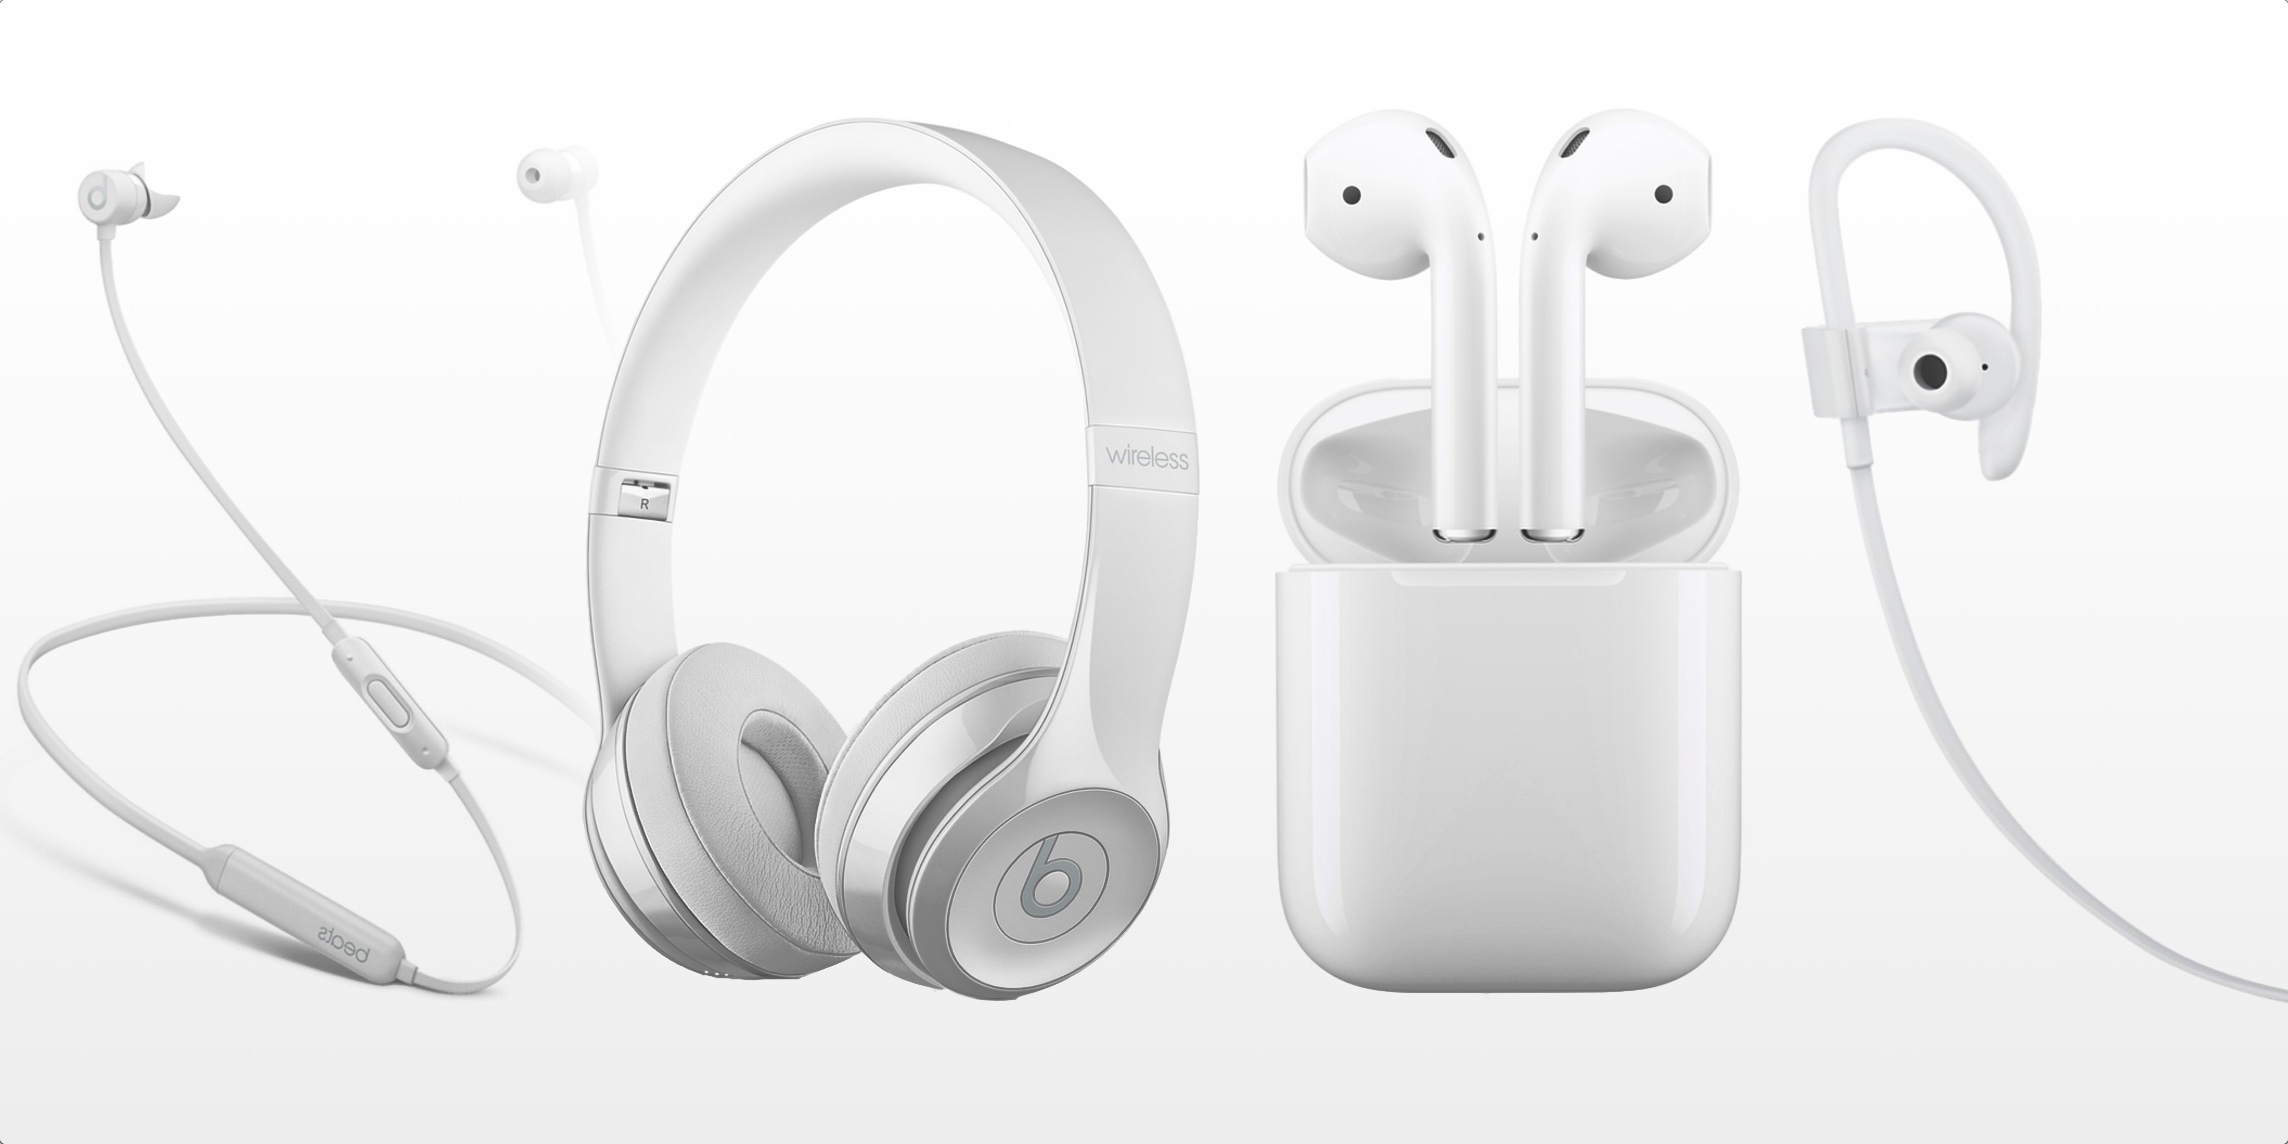 2288x1144 W1 Bluetooth Wireless Headphones Compared Apple Airpods, Beats